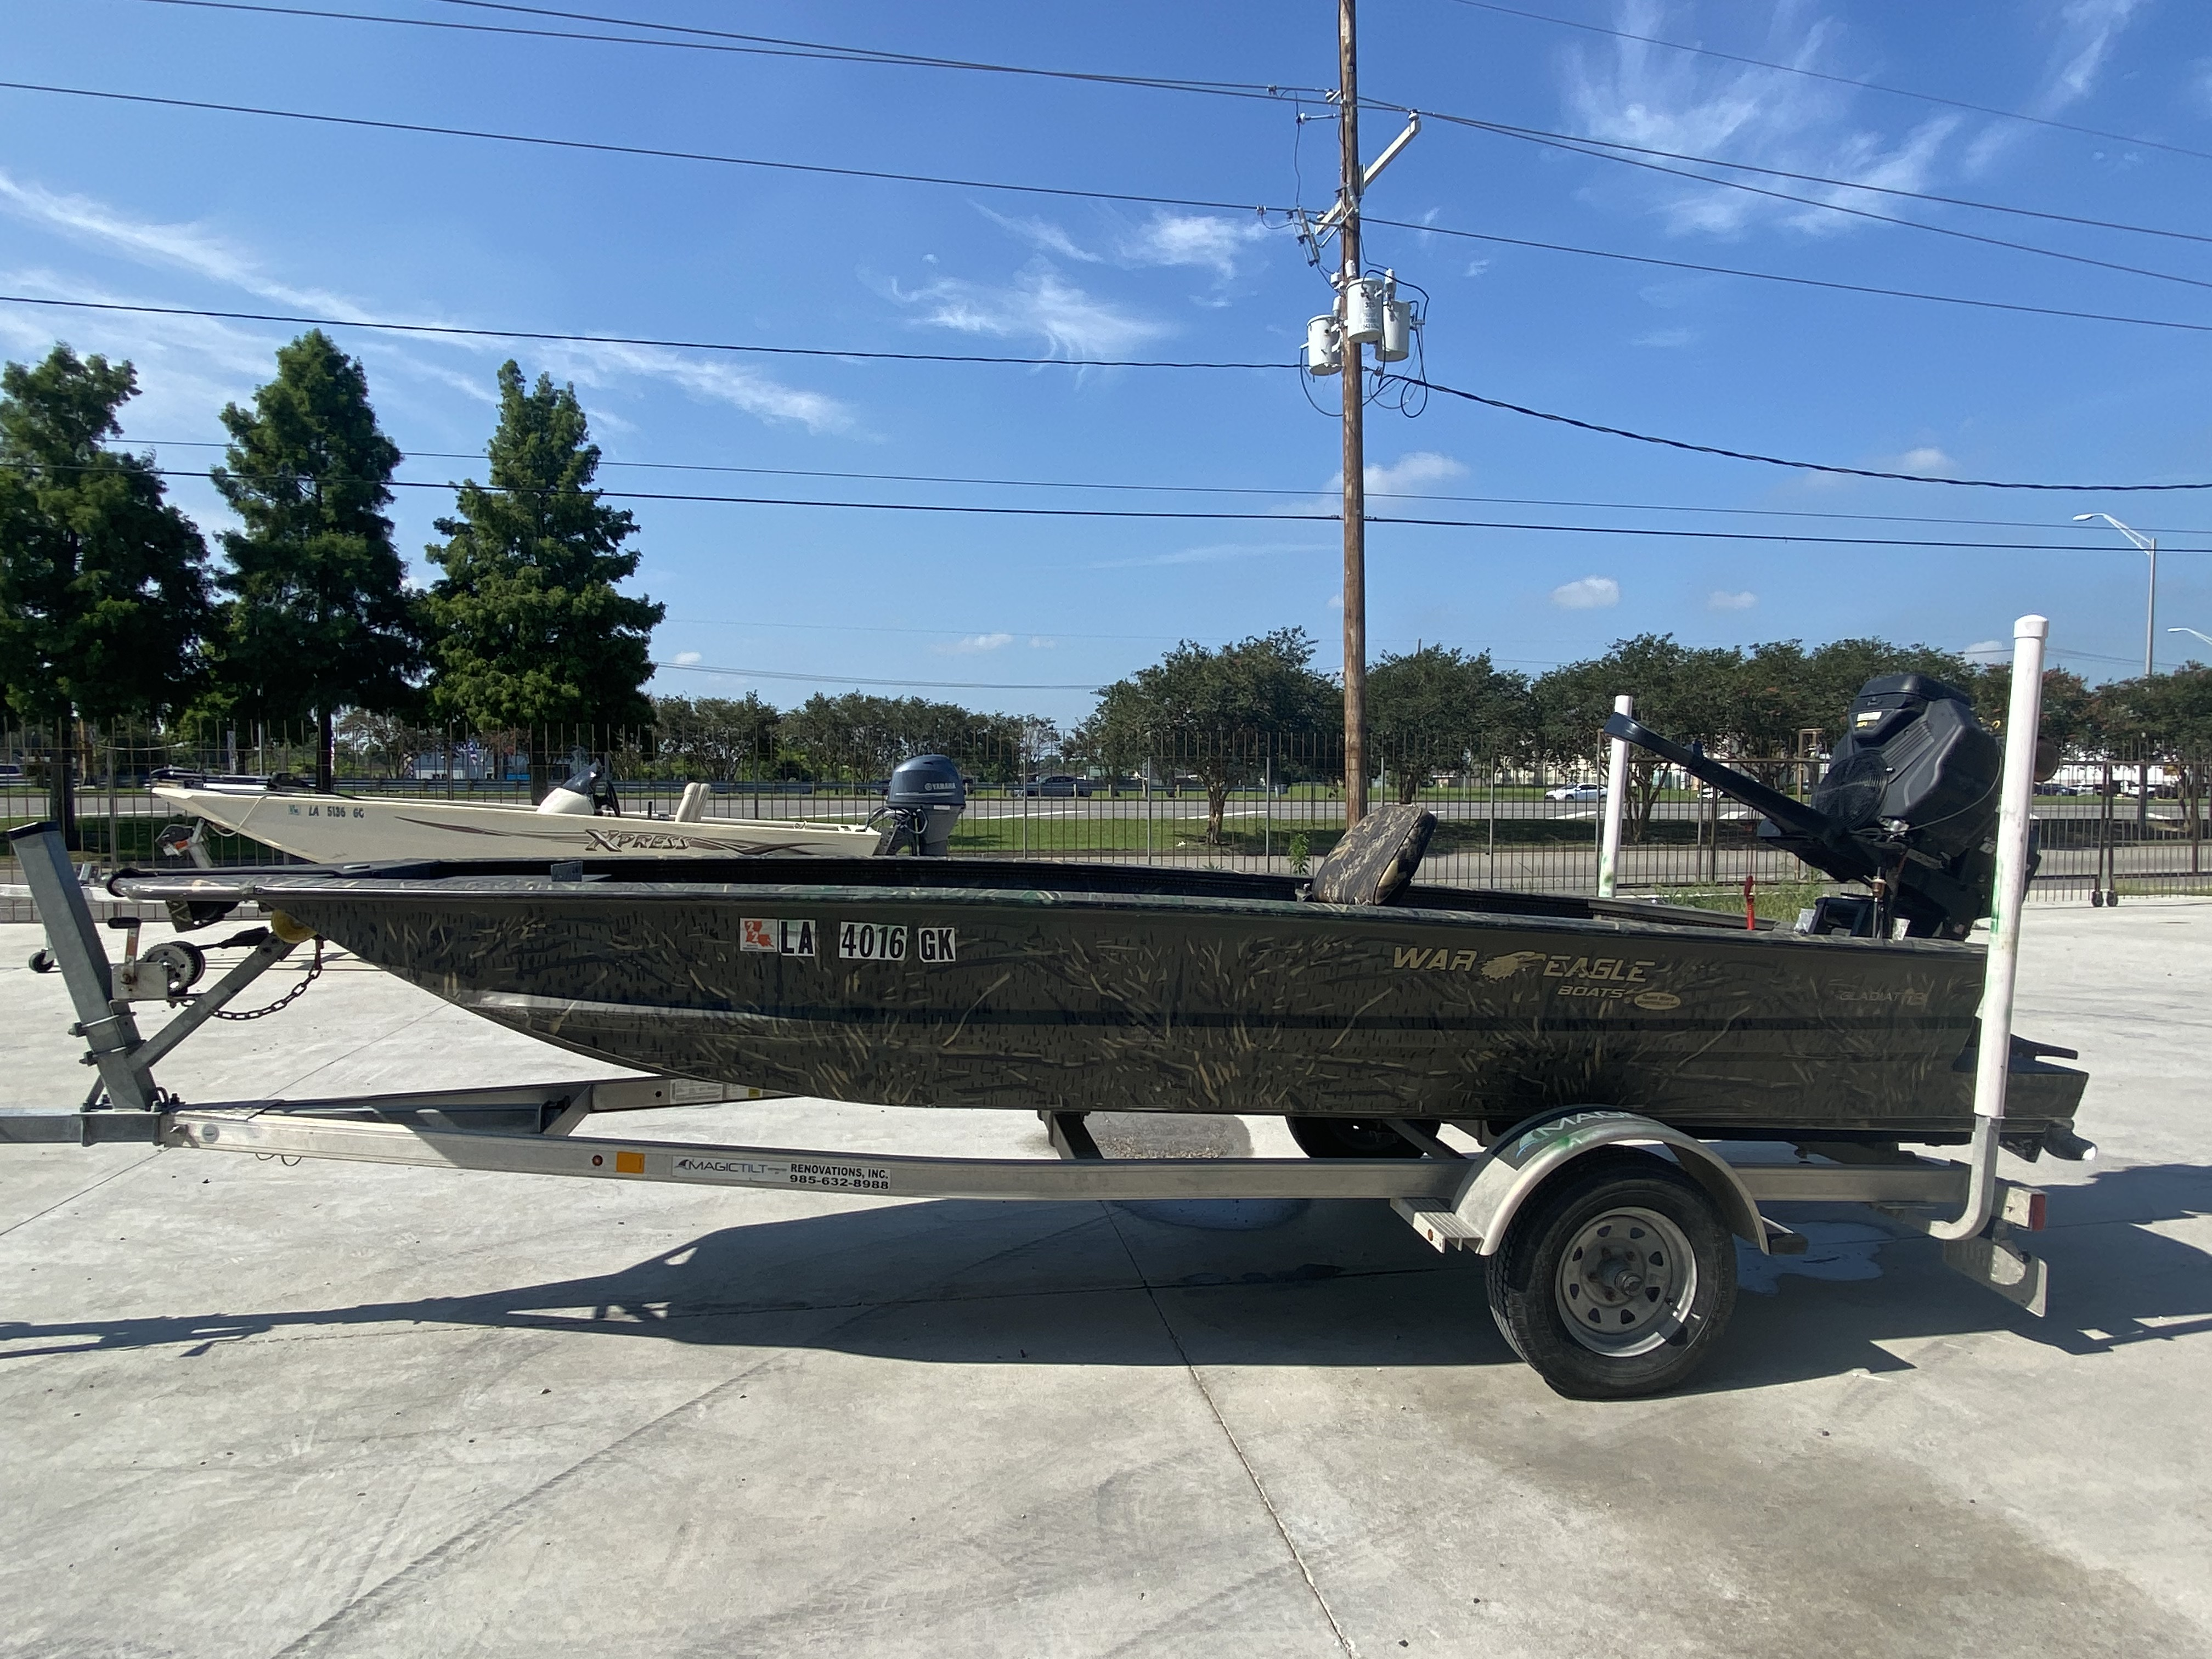 2020 War Eagle boat for sale, model of the boat is Gladiator 750 & Image # 5 of 11